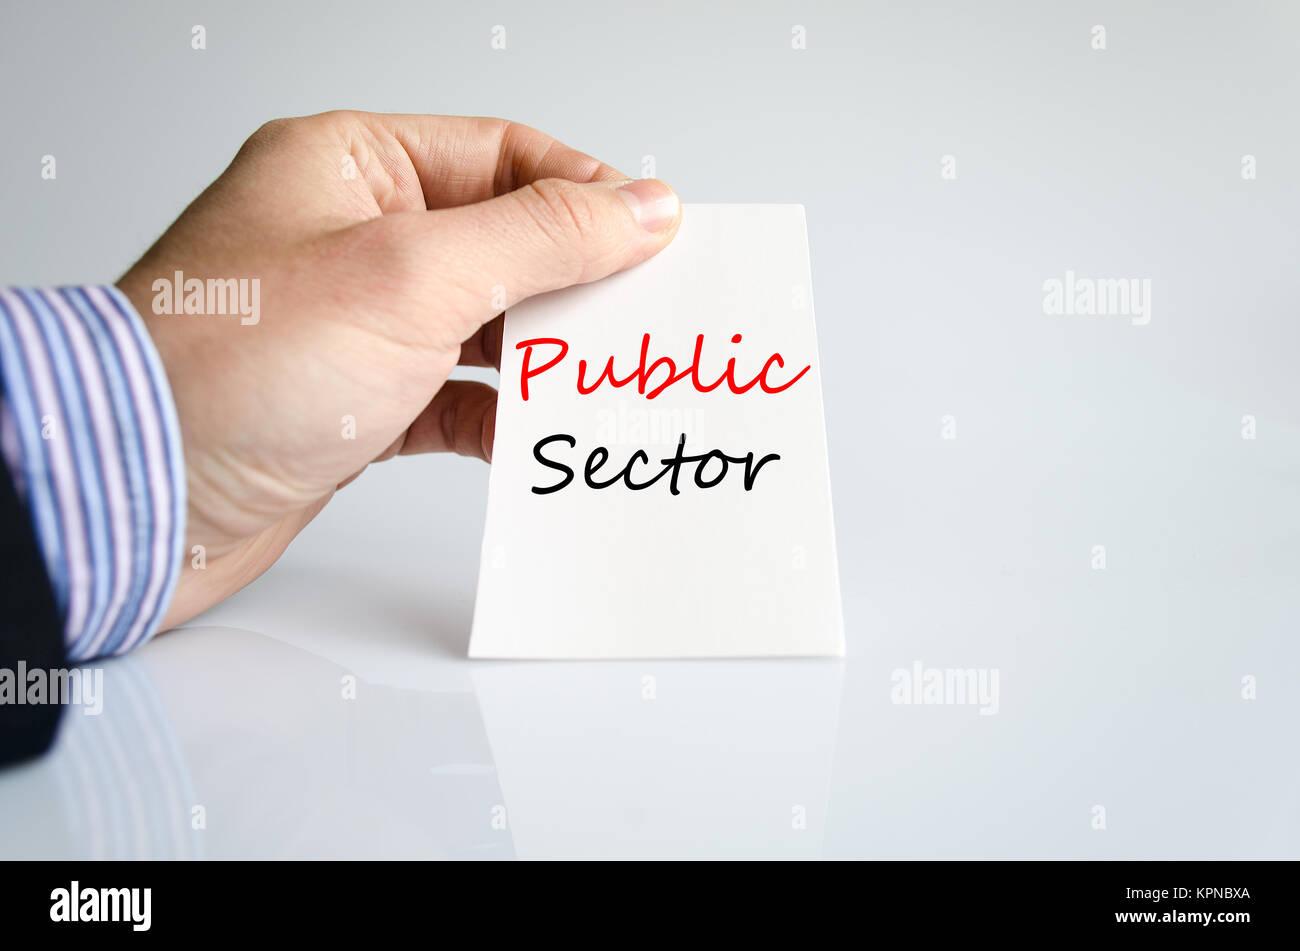 Public sector text concept Stock Photo